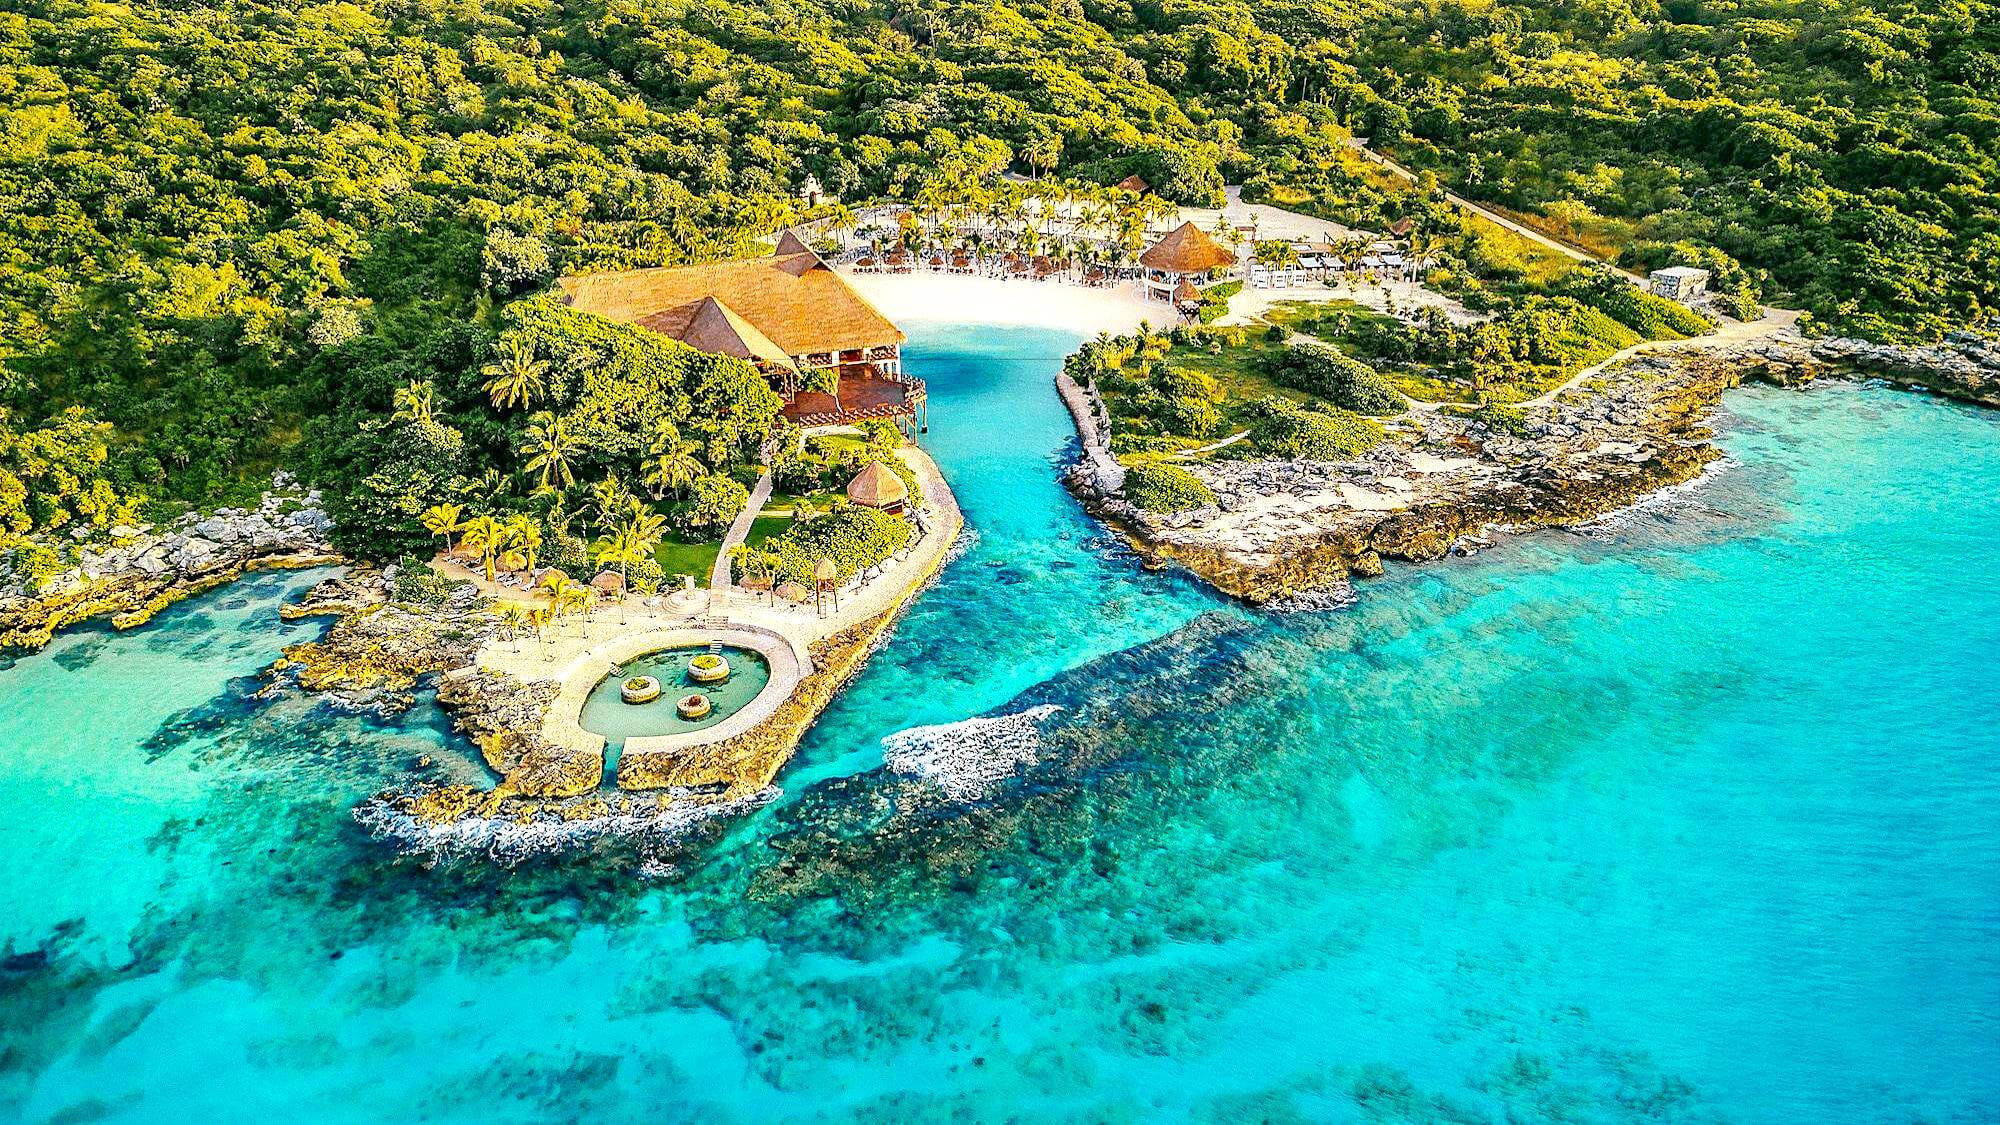 Occidental at Xcaret Destination Riviera Maya Aerial